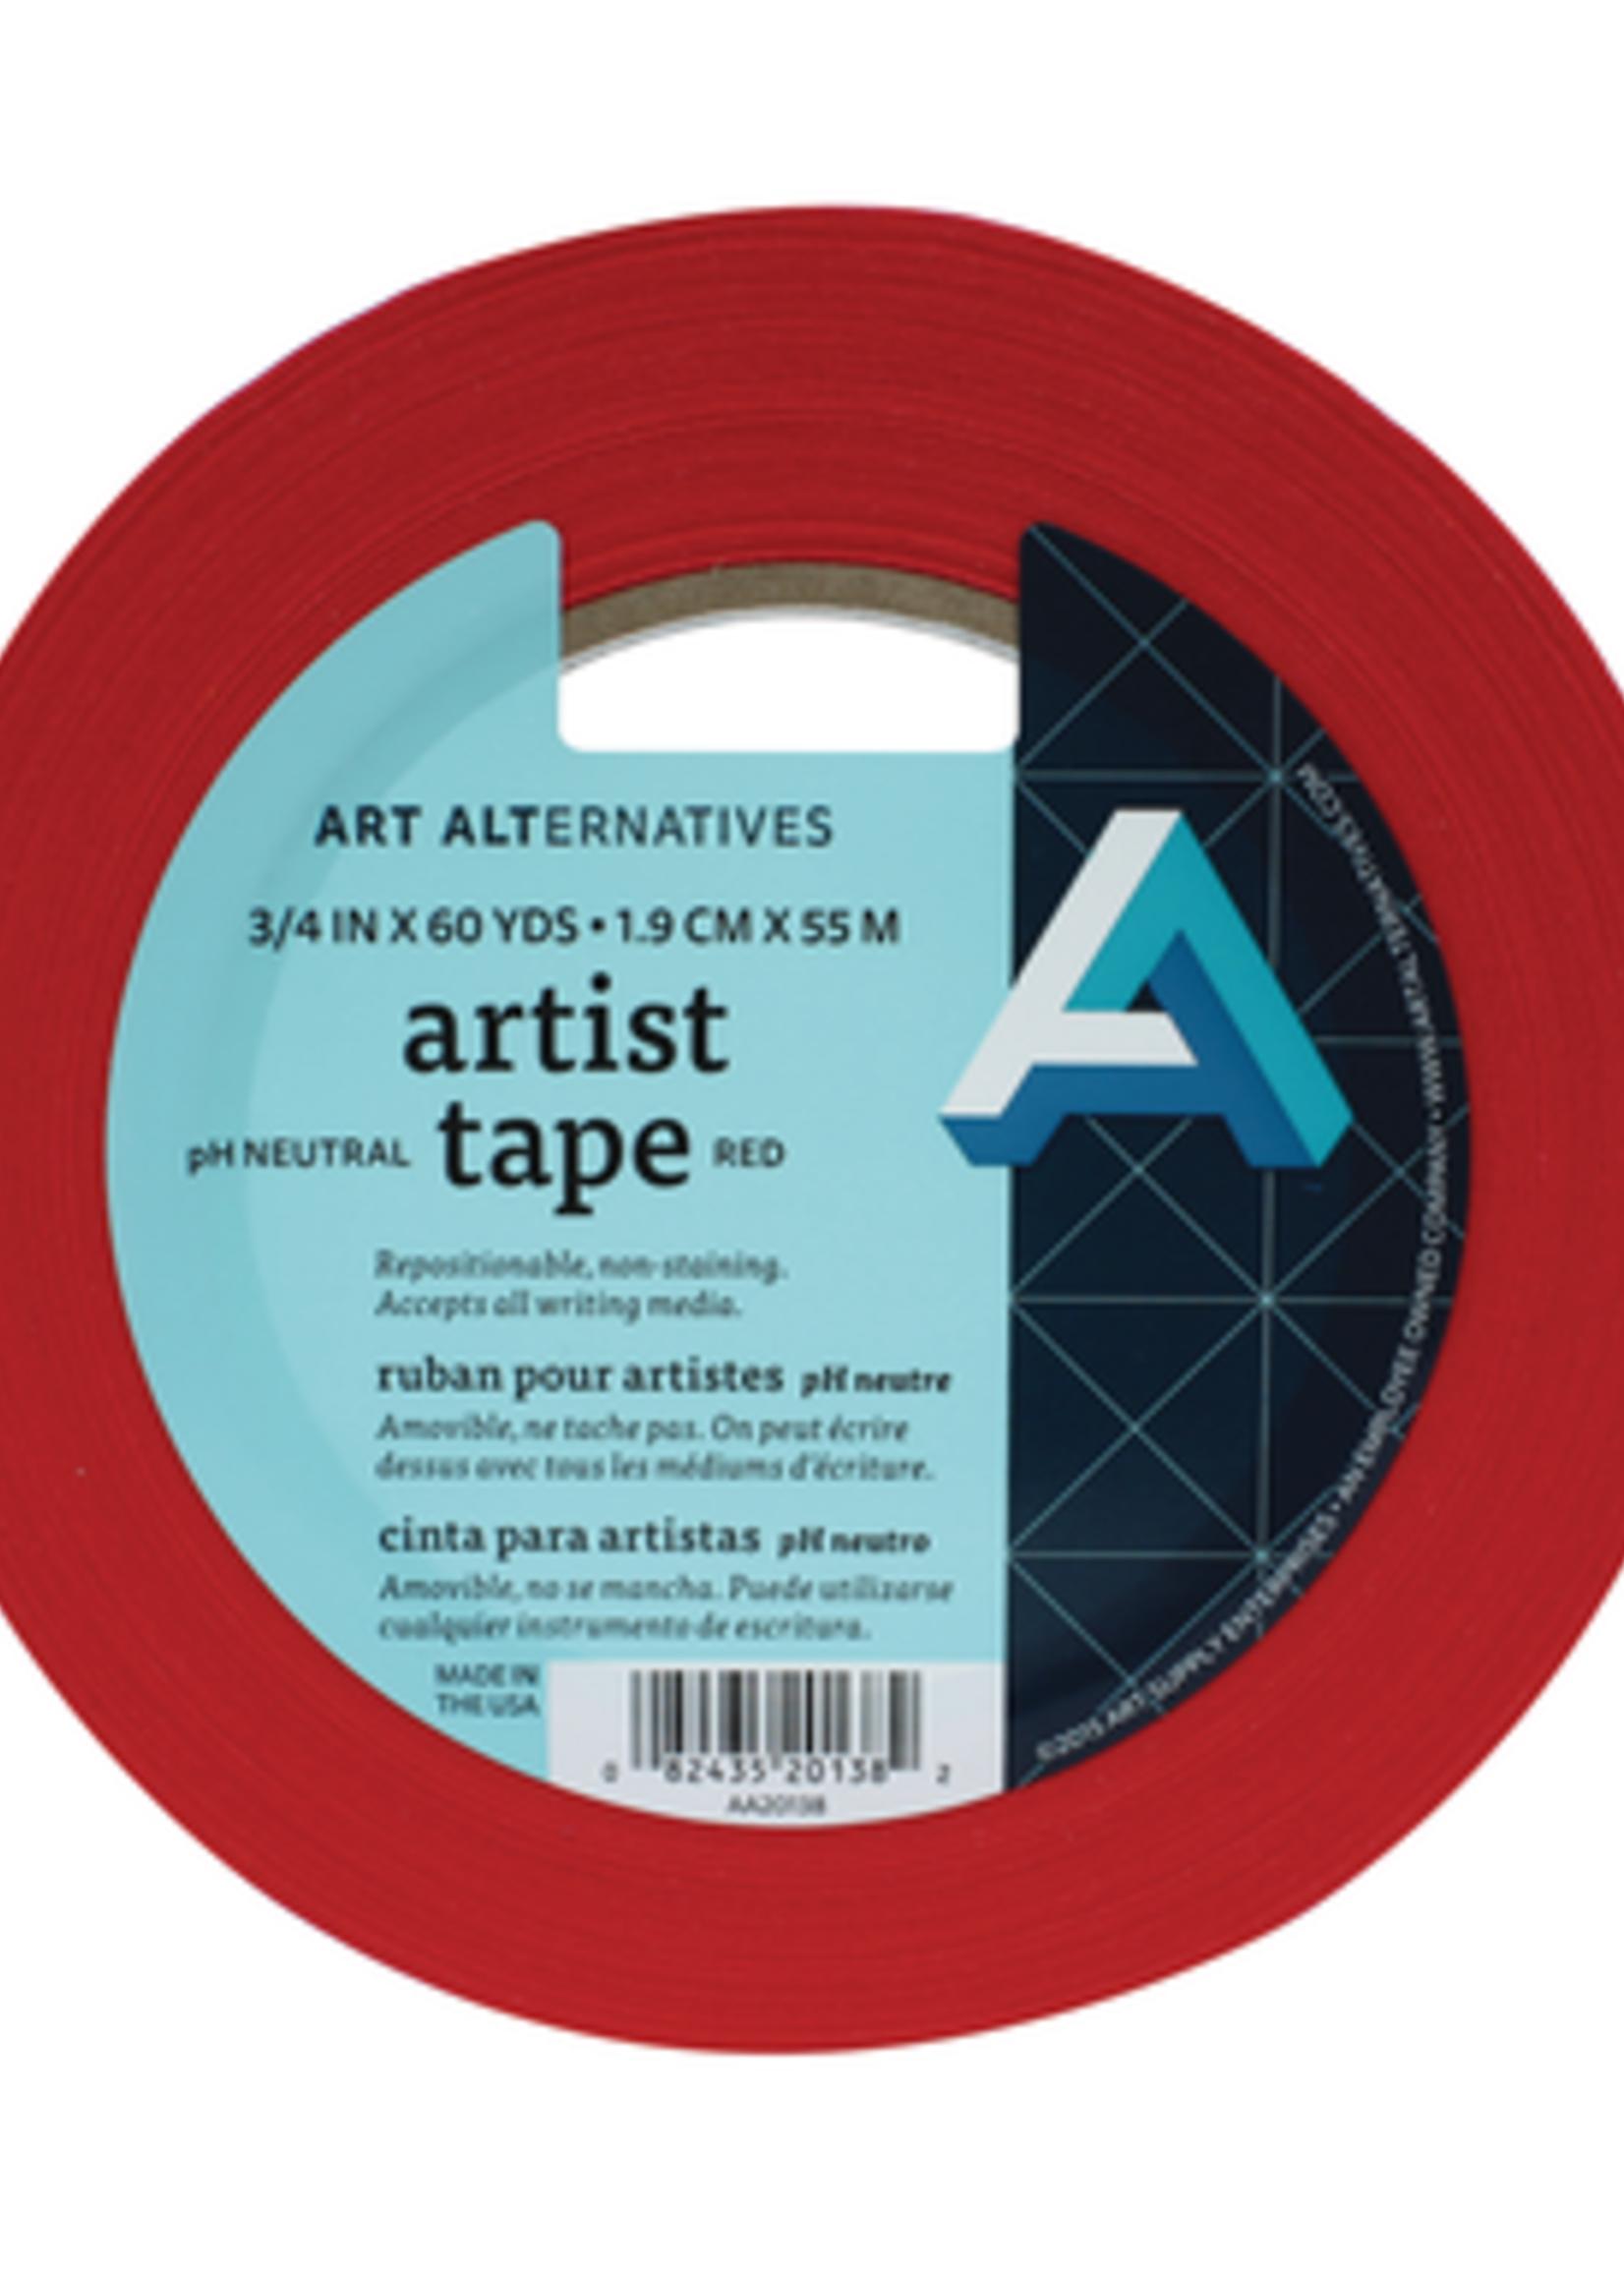 ART ALTERNATIVES ARTIST TAPE